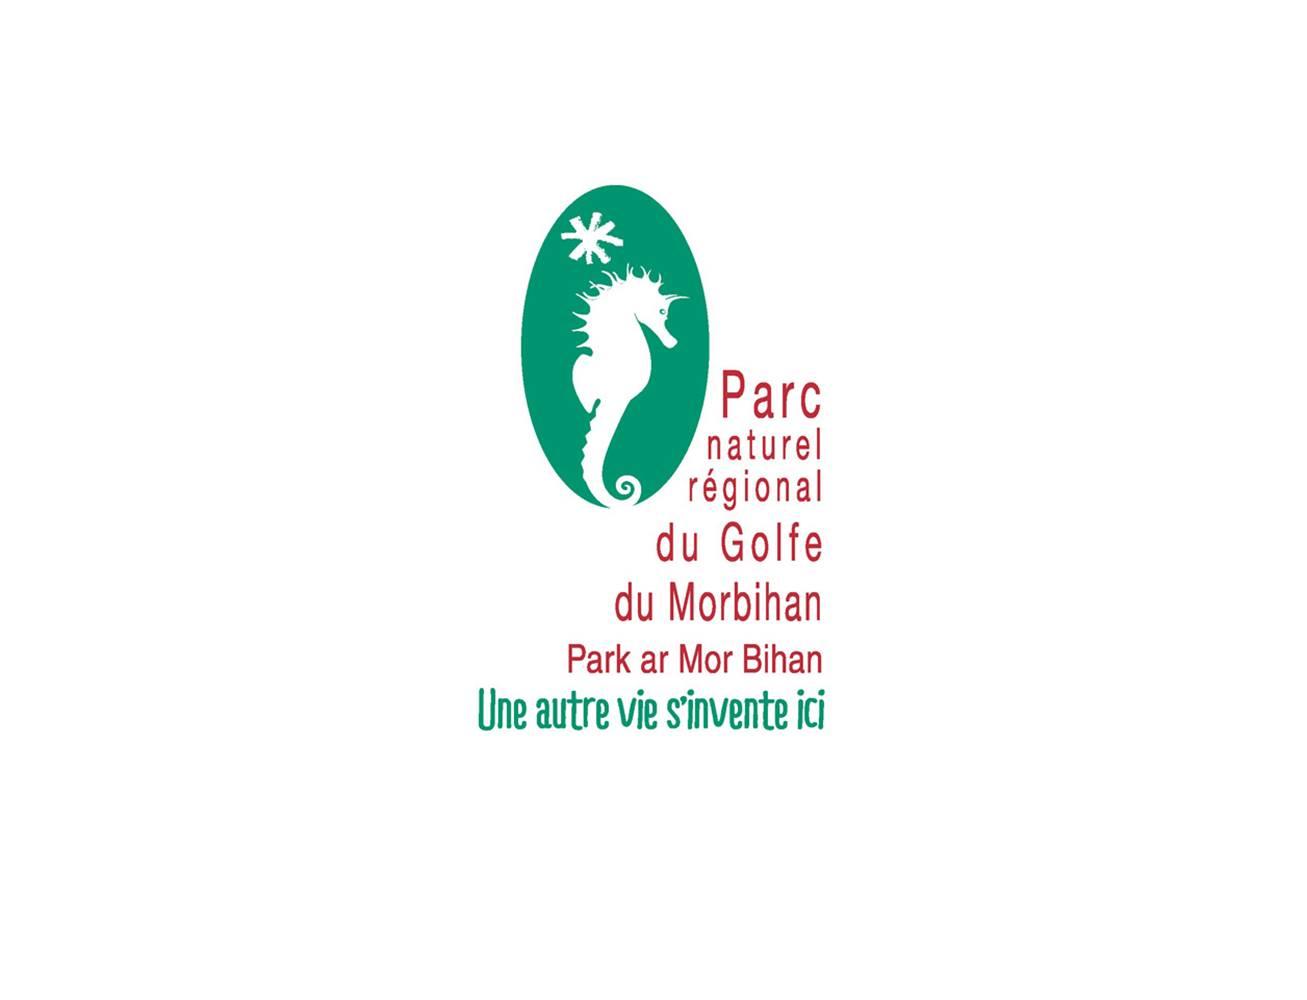 Logo-Parc-Naturel-Régional-Golfe-du-Morbihan-Bretagne sud © PNR Golfe du Morbihan